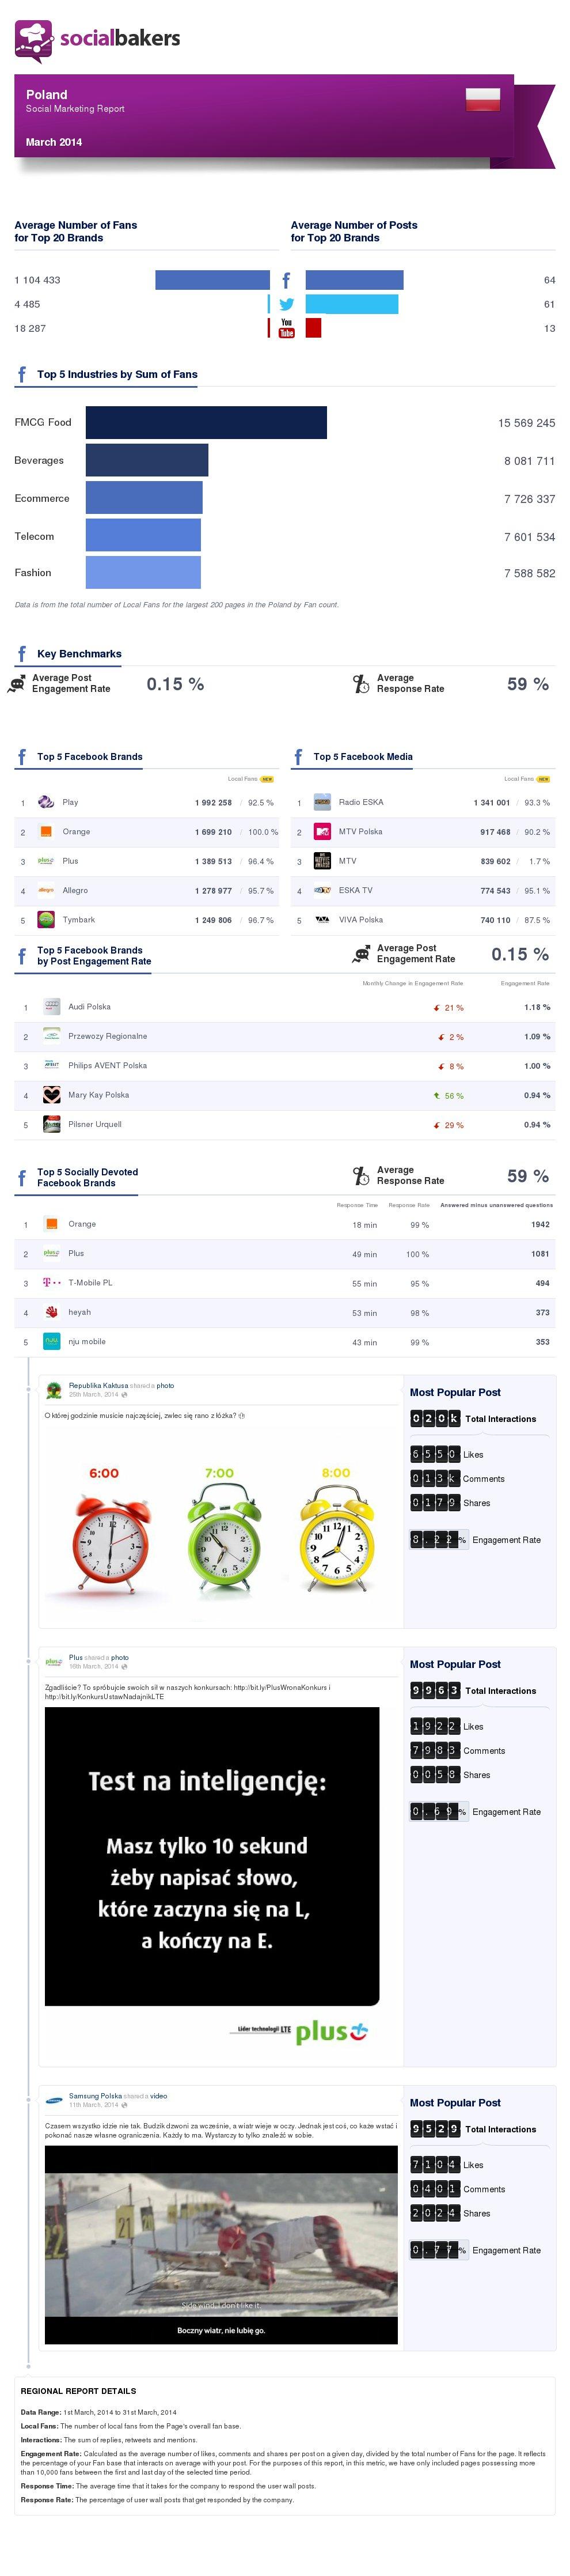 march-2014-social-marketing-report-poland-regional-thumbnail